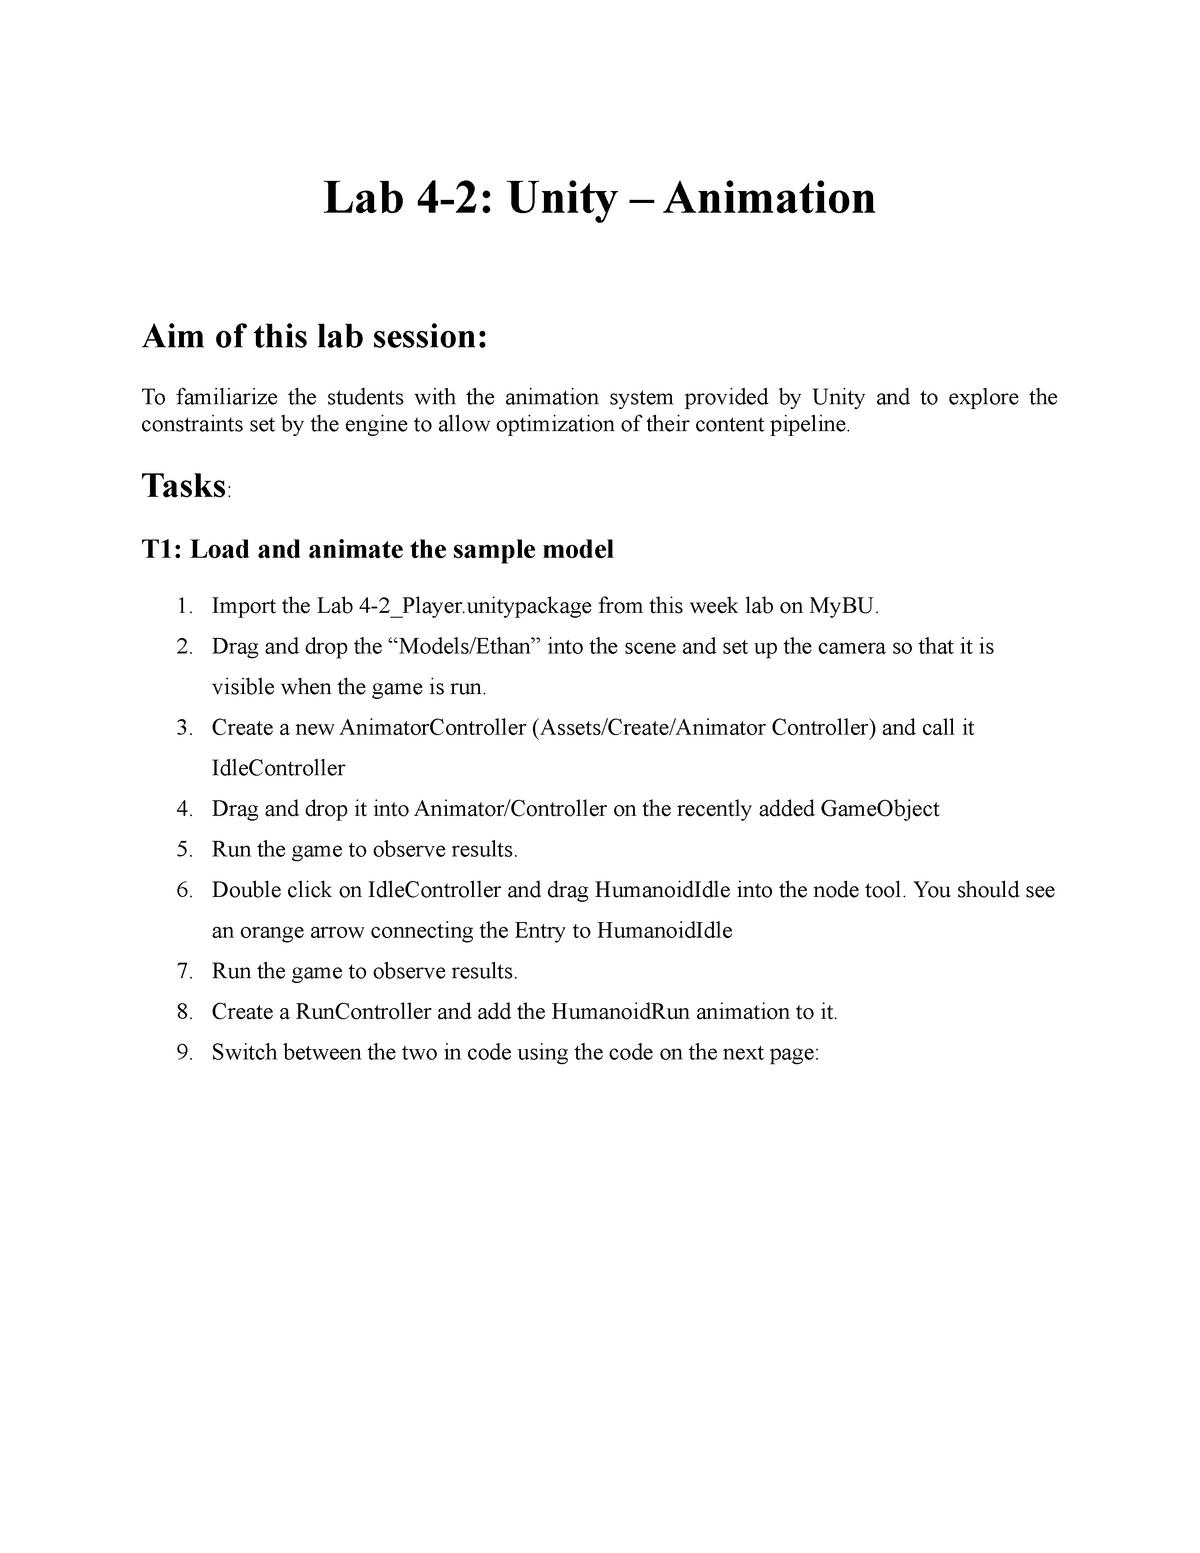 Lab 4-2 - Unity - animation - Mobile Games Programming - StuDocu